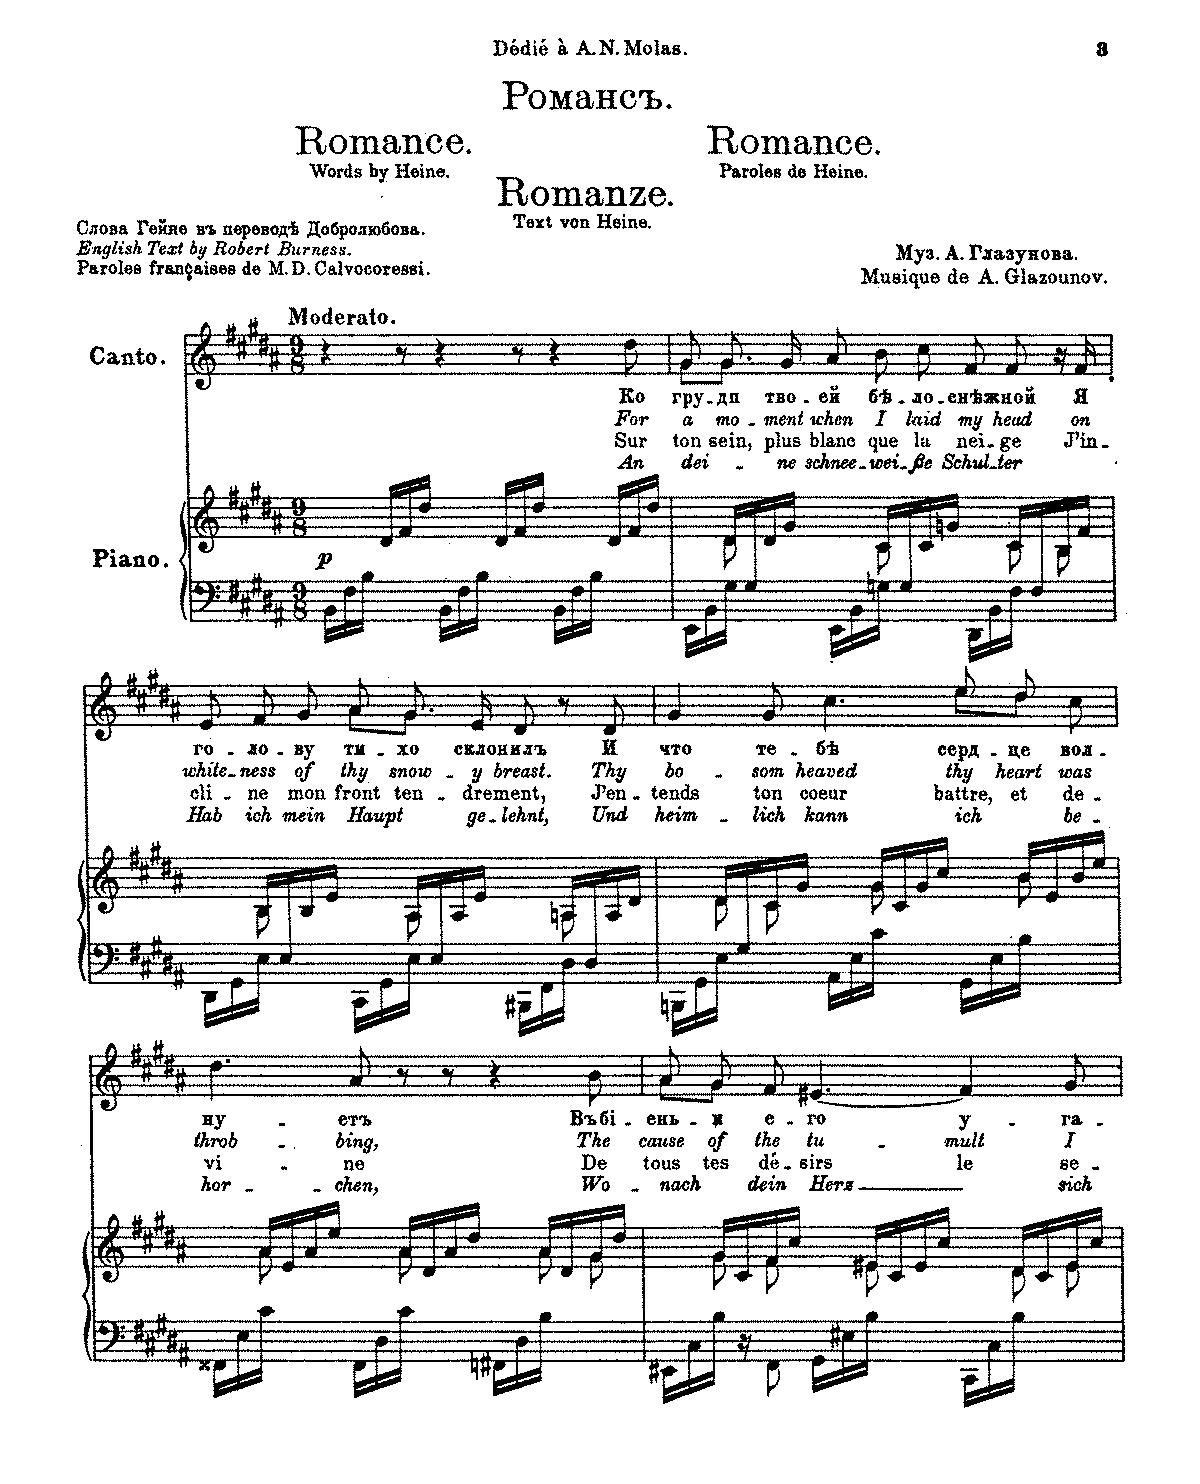 Free Sheet Music Public Domain: 5 Romances, Op.4 (Glazunov, Aleksandr)